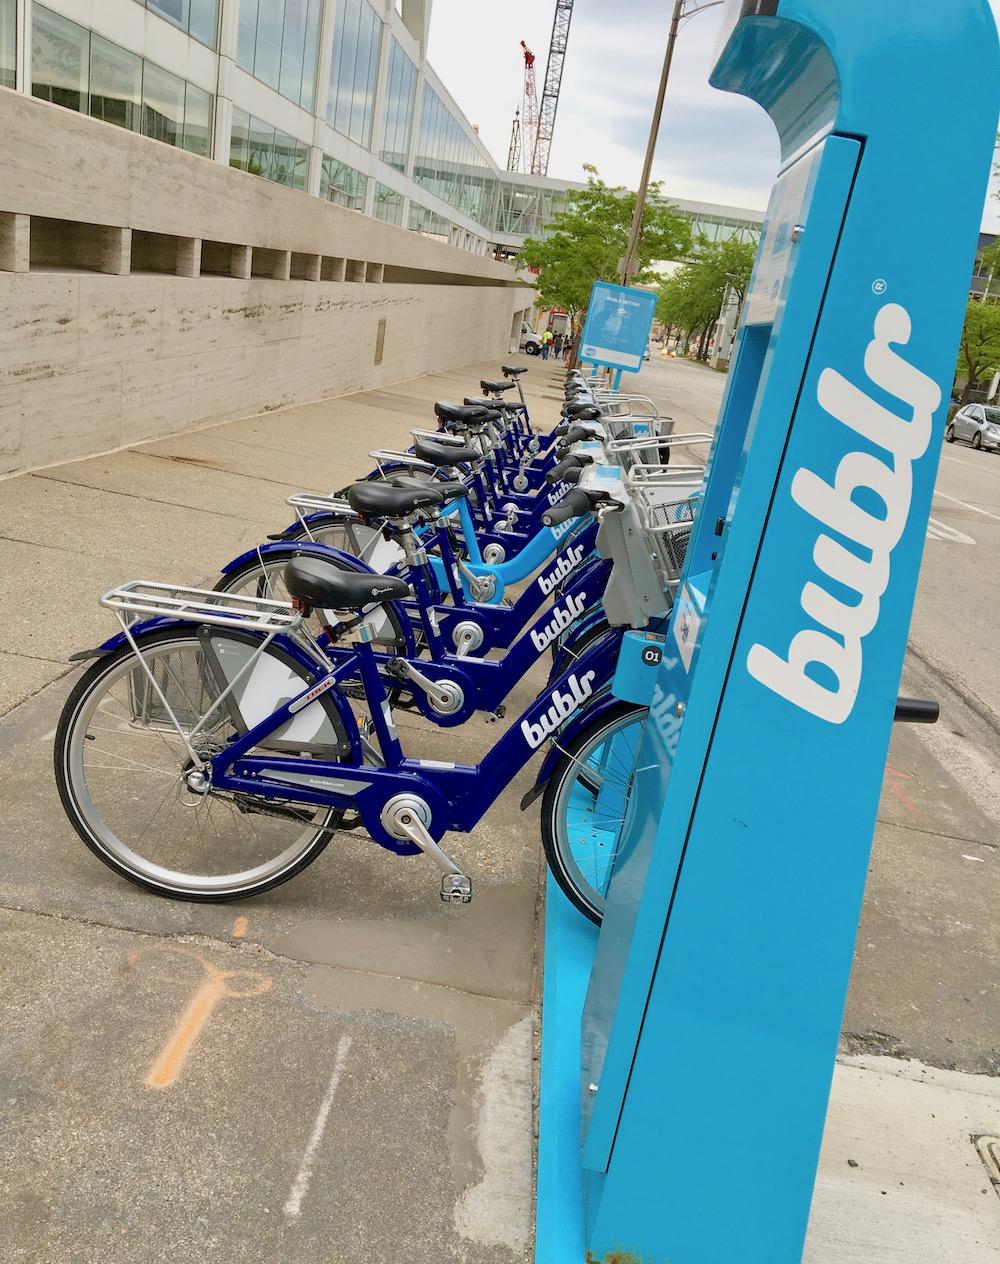 MKE bublr bikes.jpg